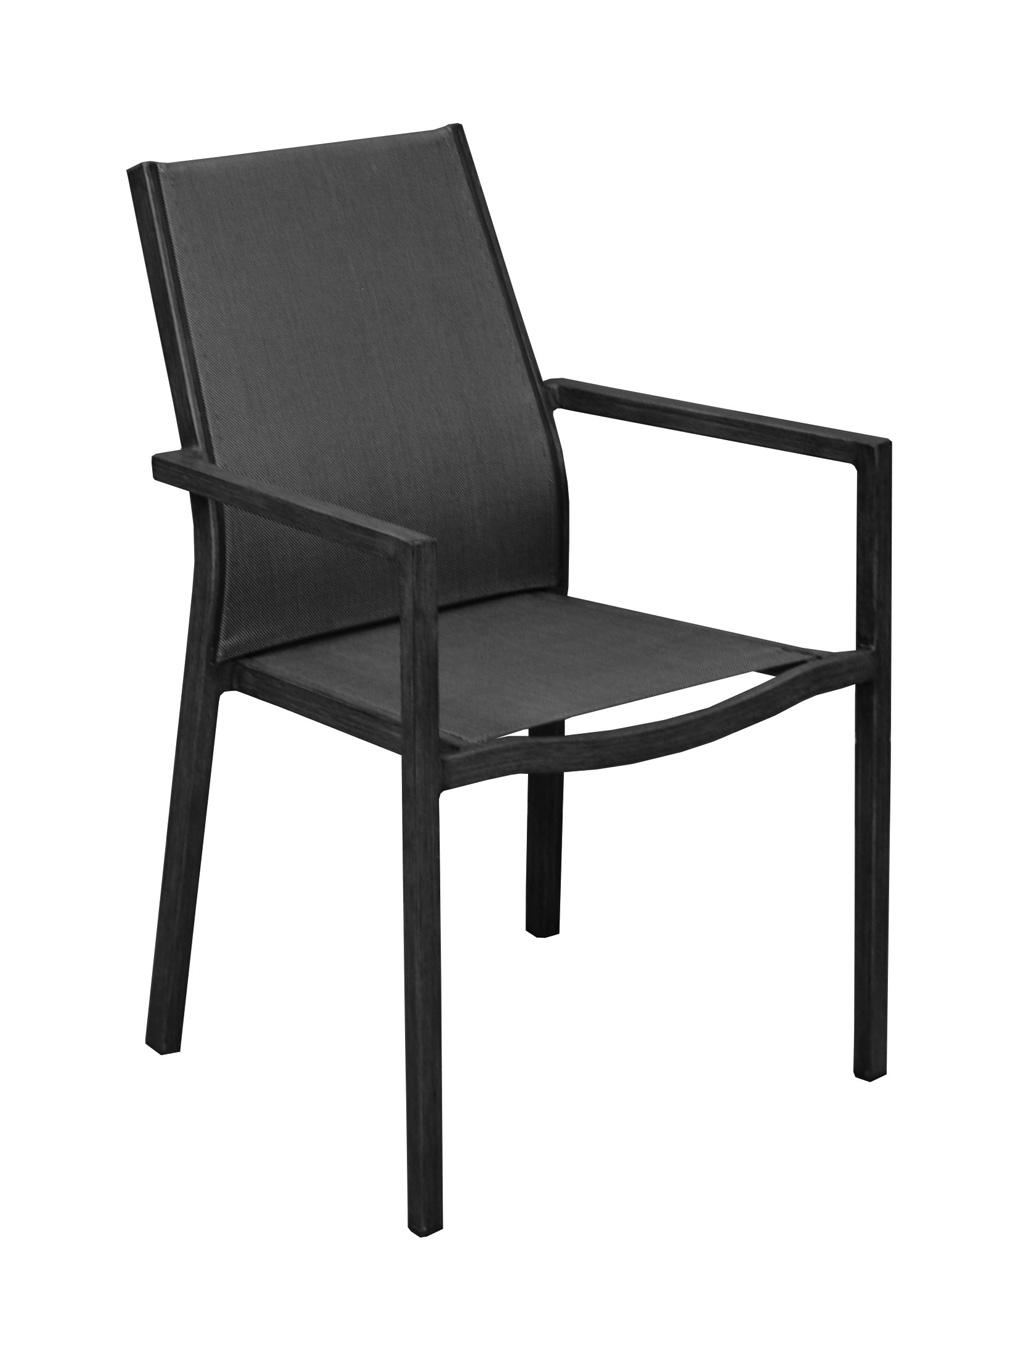 fauteuil flore oc o sun mobilier. Black Bedroom Furniture Sets. Home Design Ideas